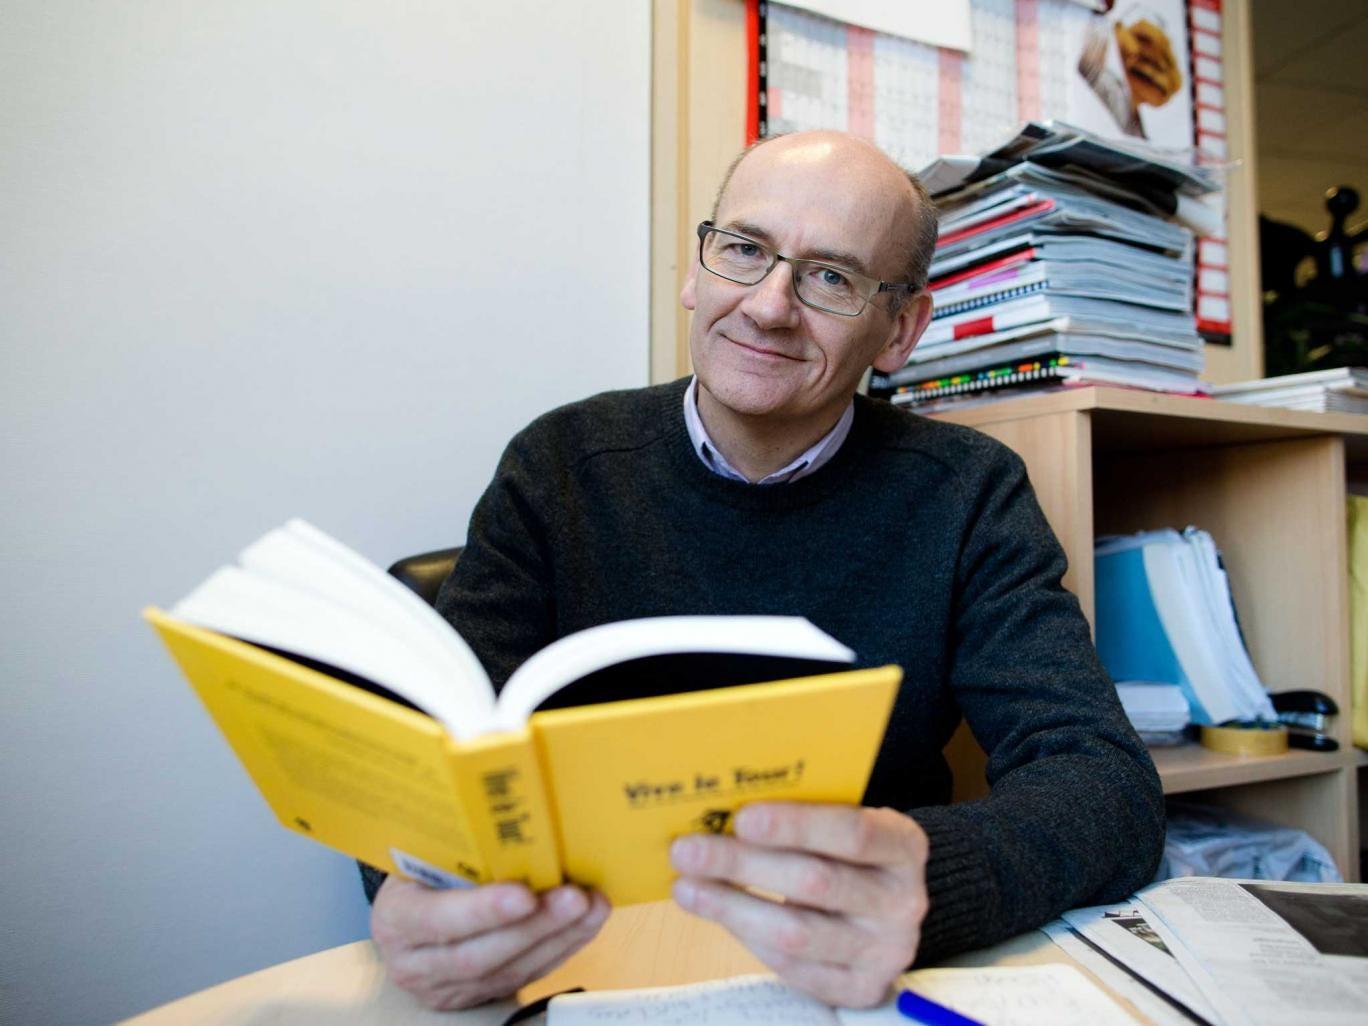 Deep in thought: Simon O'Hagan sets a quiz